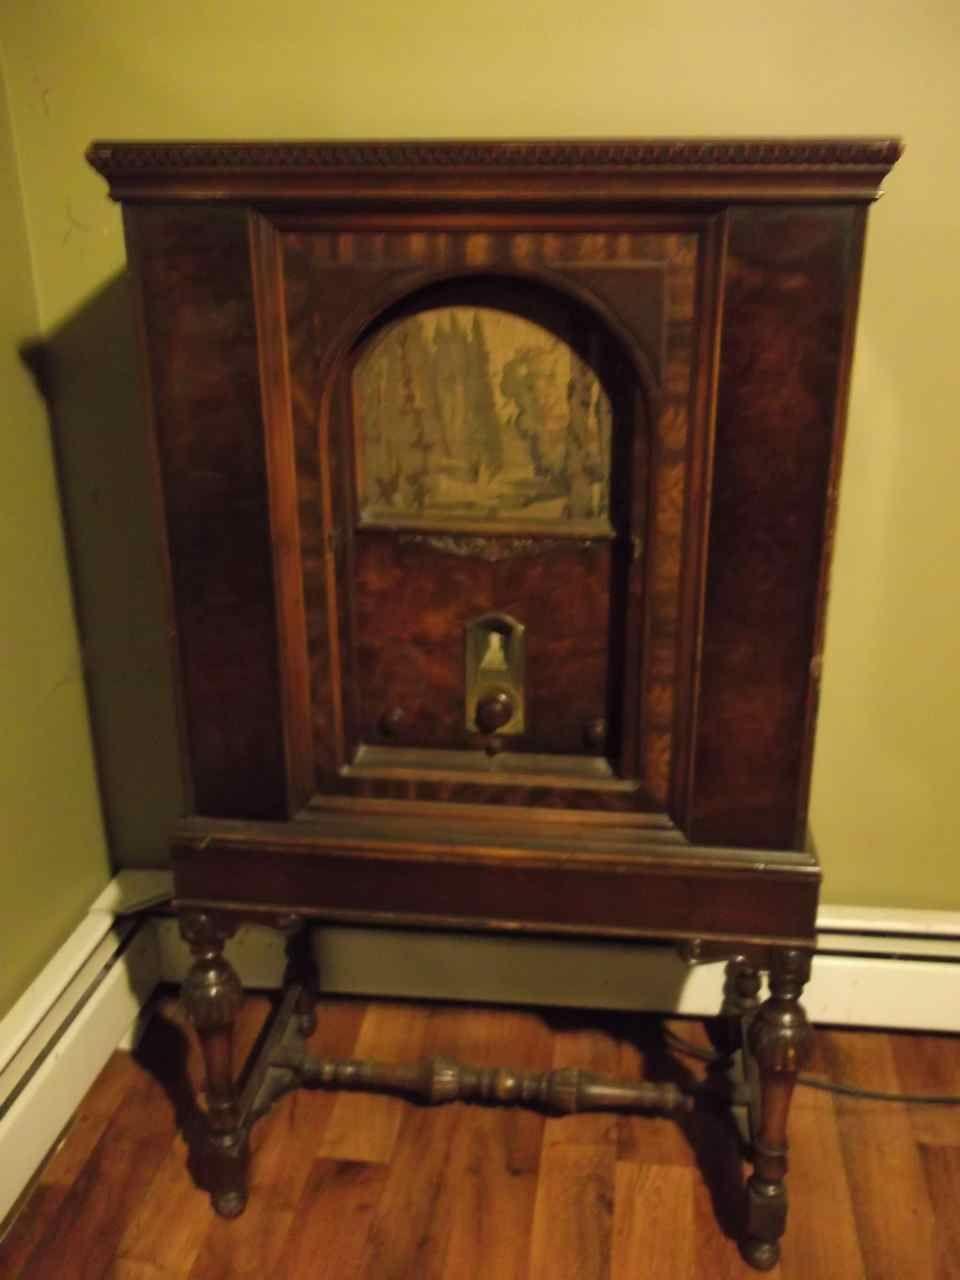 1940s Wooden Philco Radio Cabinet antique appraisal   InstAppraisal - 1940s Wooden Philco Radio Cabinet Antique Appraisal InstAppraisal